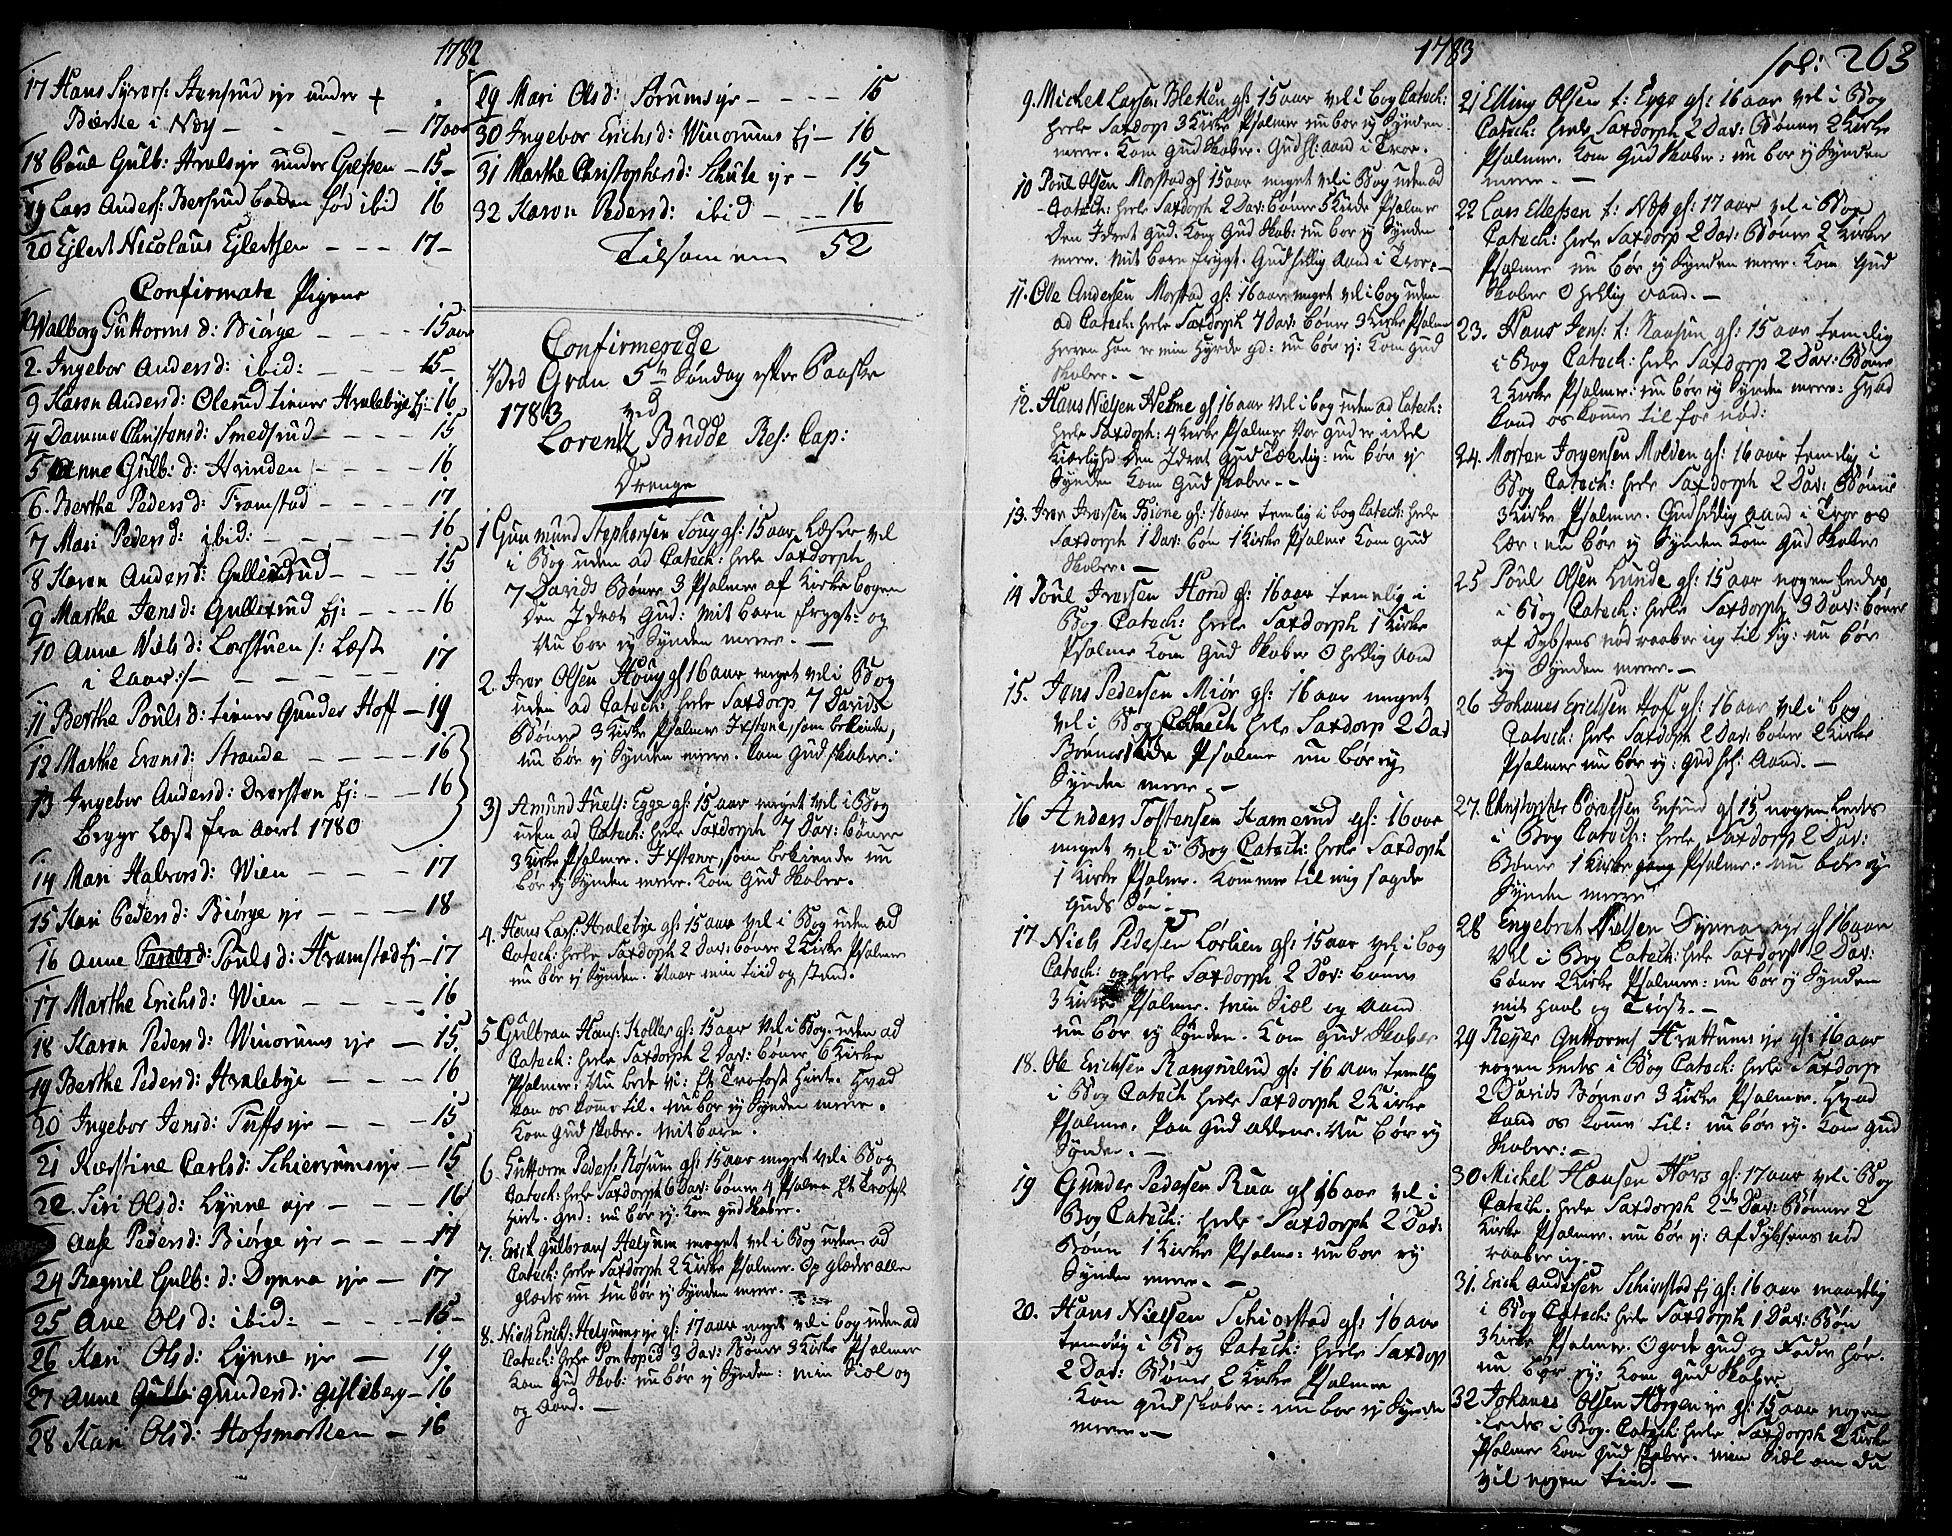 SAH, Gran prestekontor, Ministerialbok nr. 5, 1776-1788, s. 263